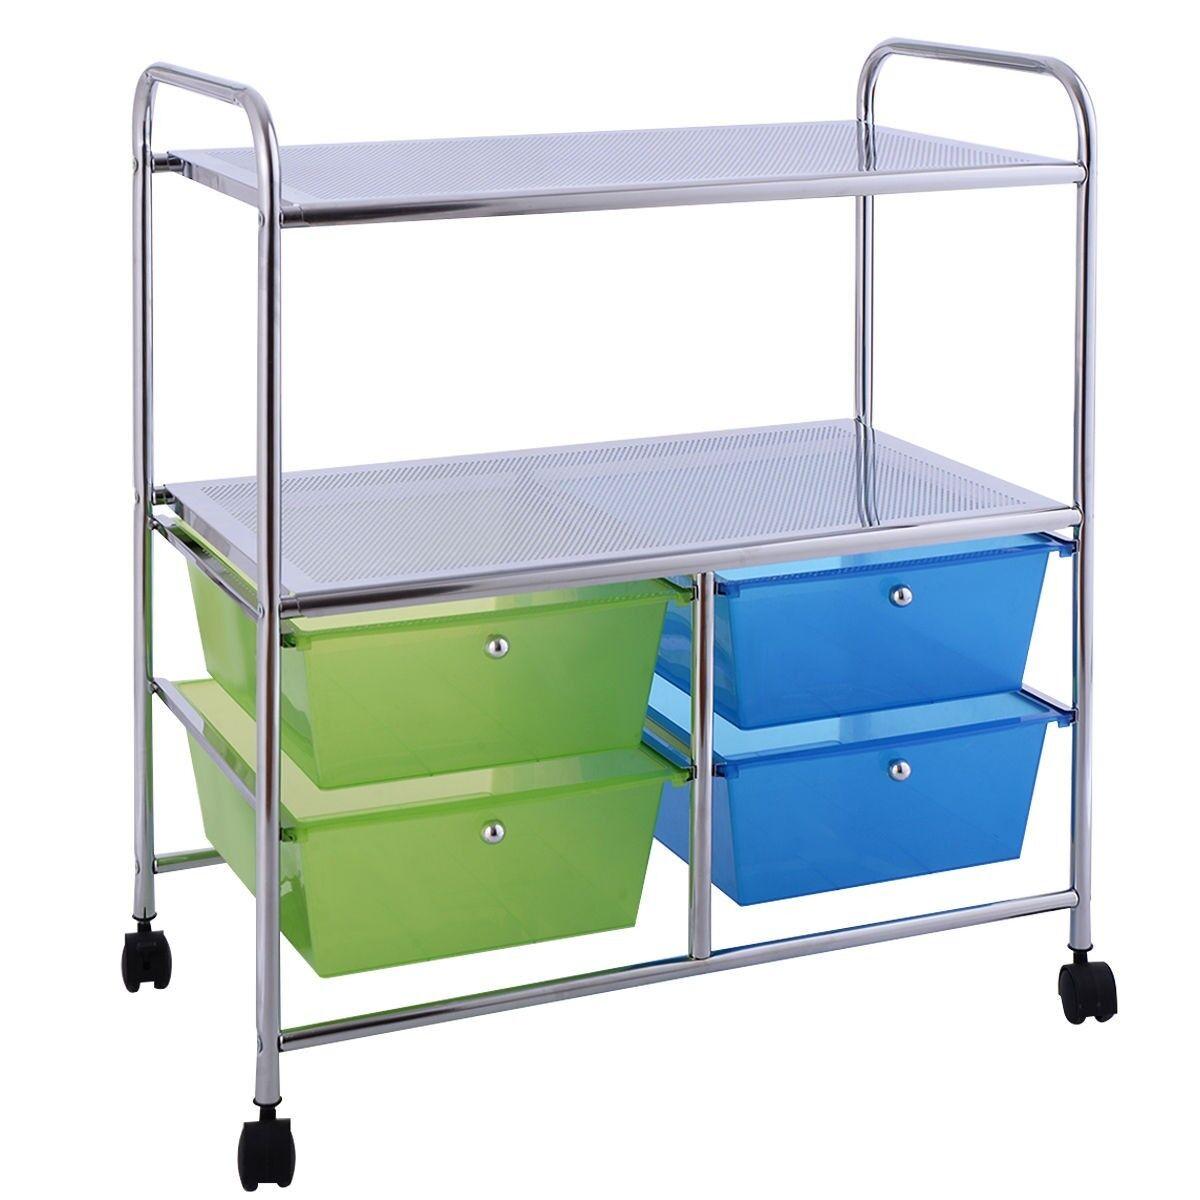 4 Drawers Rolling Plastic Storage Cart Shelf Tiers Organizer Wheel Basket Steel